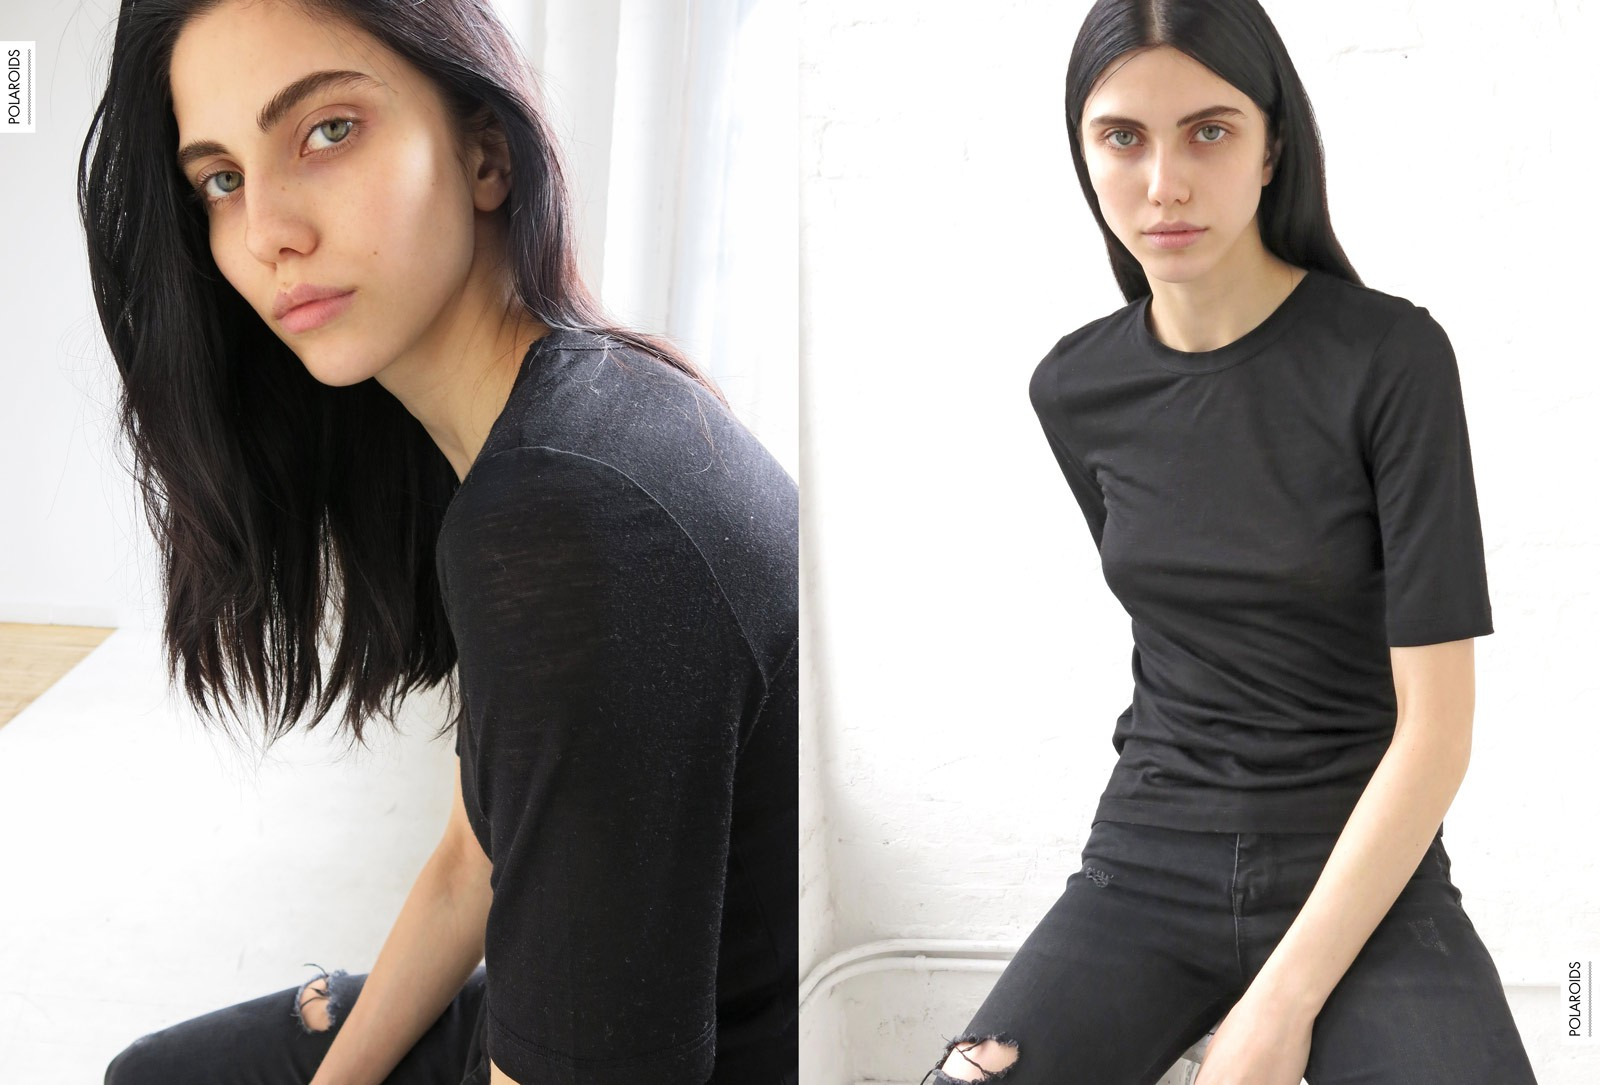 MOTW_DianaGalimullina_Women5_web-1600_05